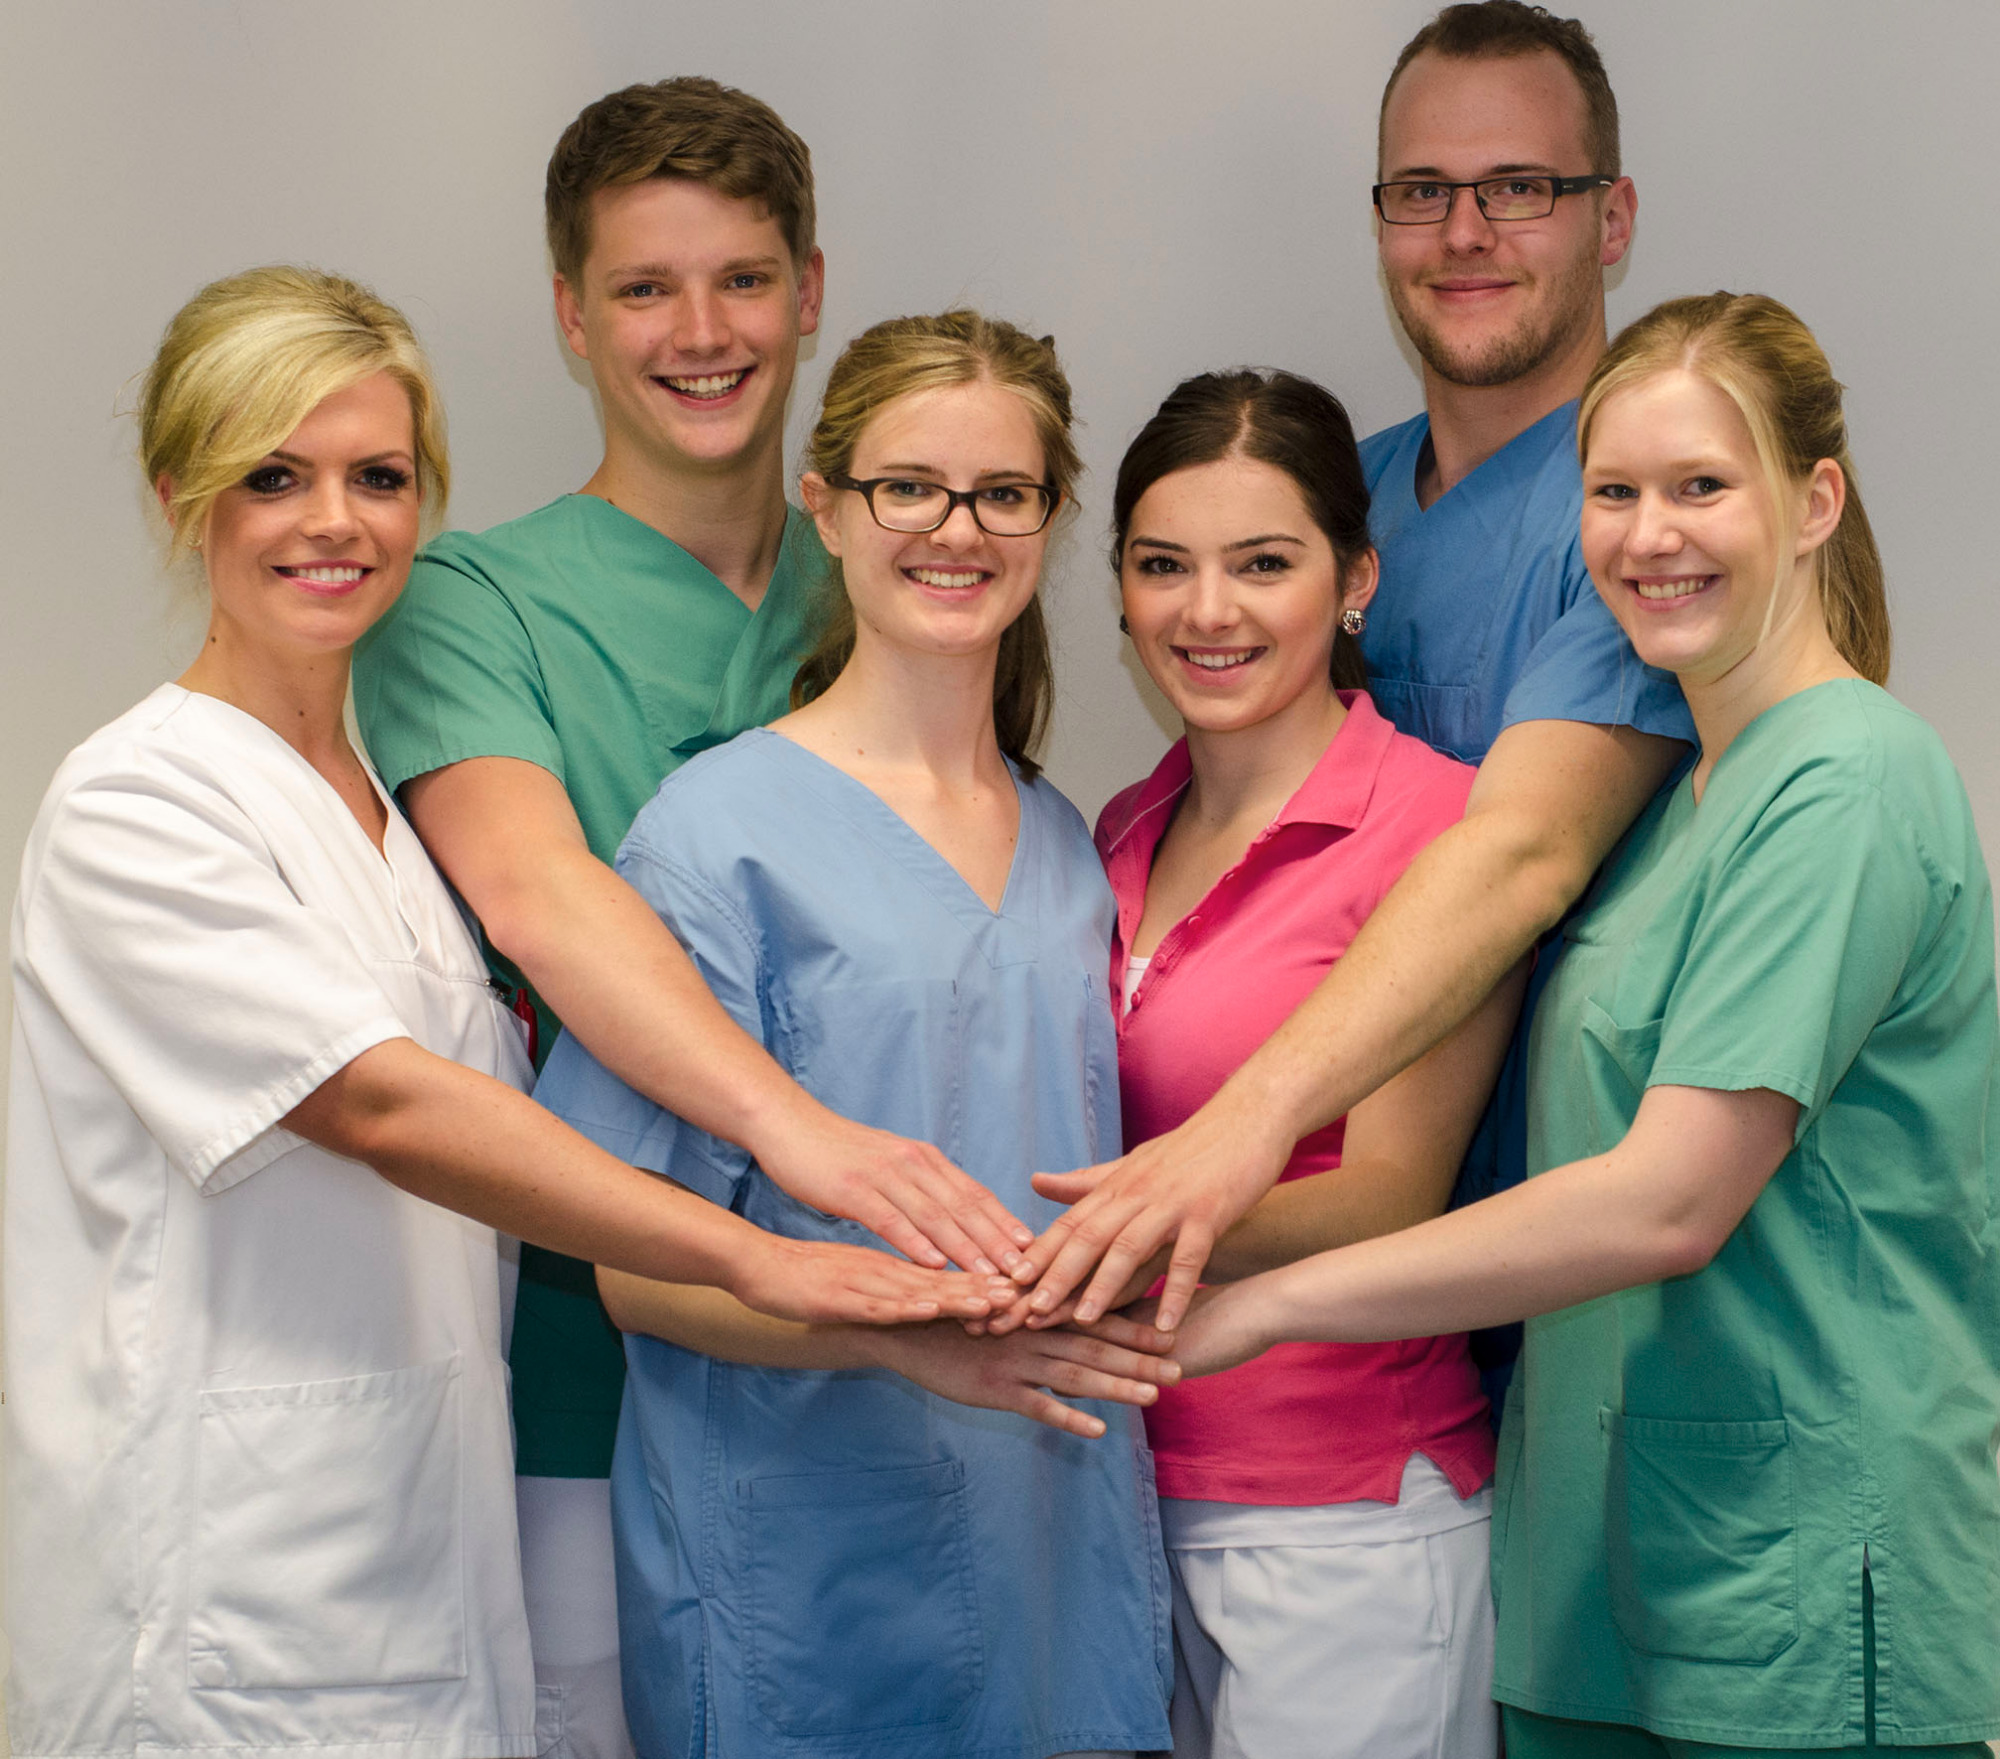 Ausbildung / St.-Marien-Hospital Marsberg